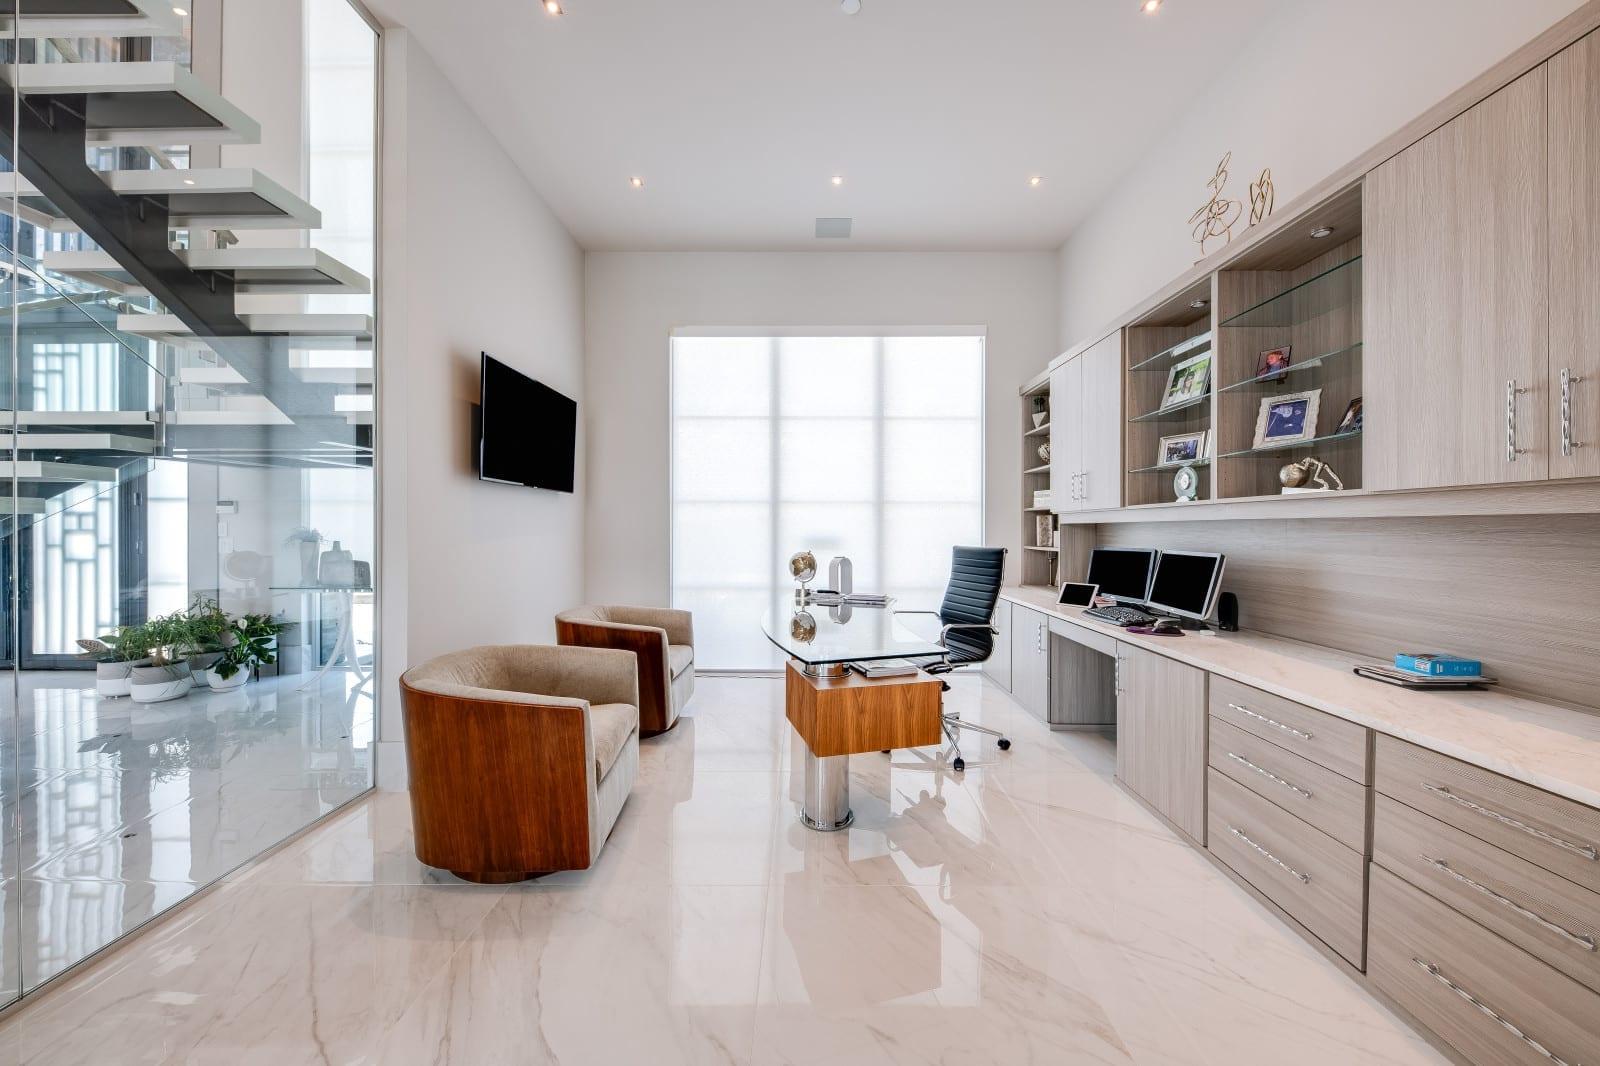 Custom Home Build and Interior Design # 22 - Millennial Design + Build, Home Builders in Dallas Texas, modern style homes, and custom home builders in DFW